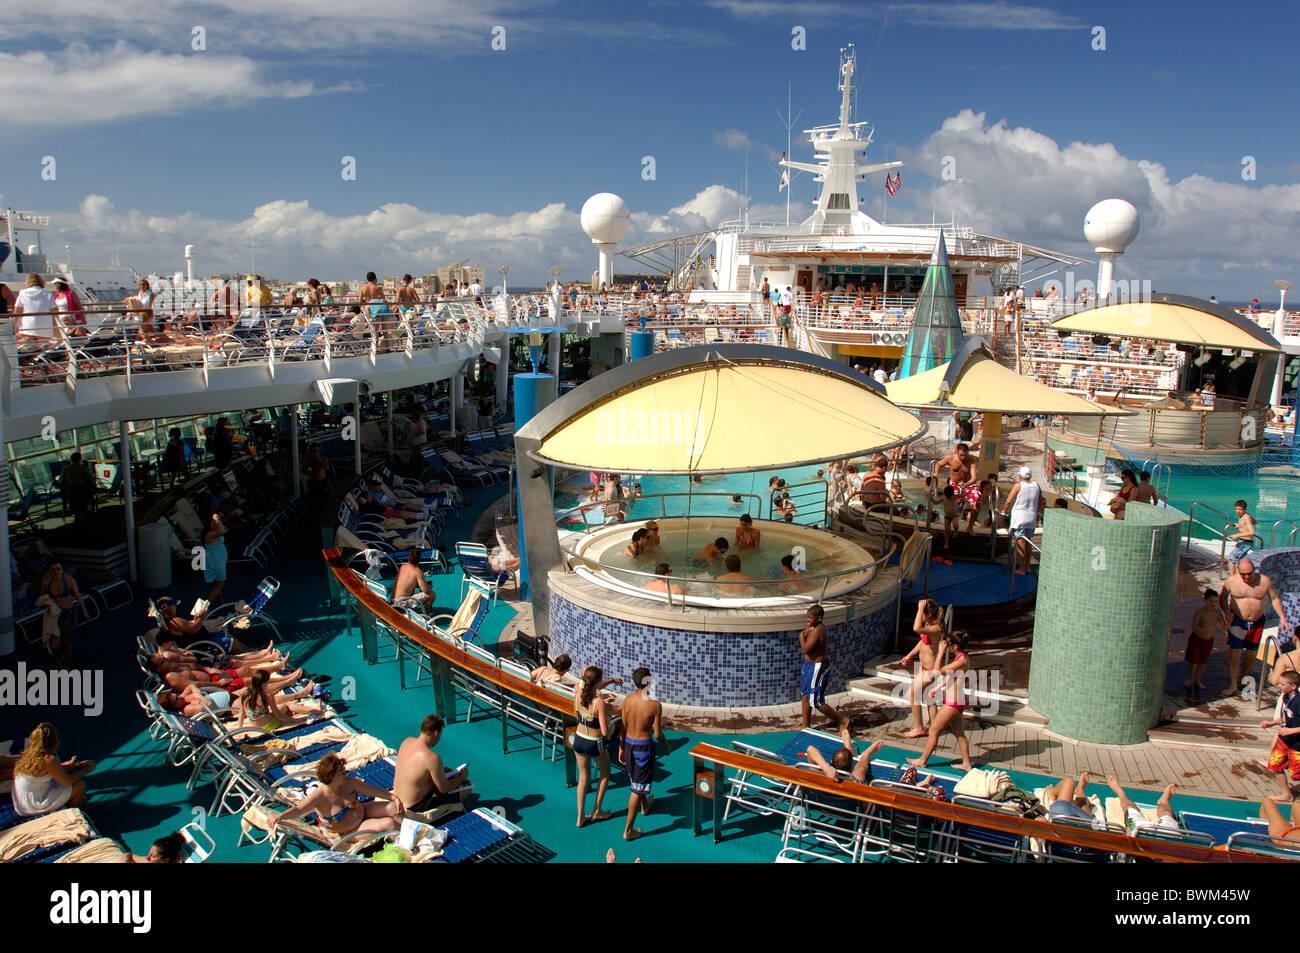 sun deck voyager of the seas royal caribbean cruise line san juan